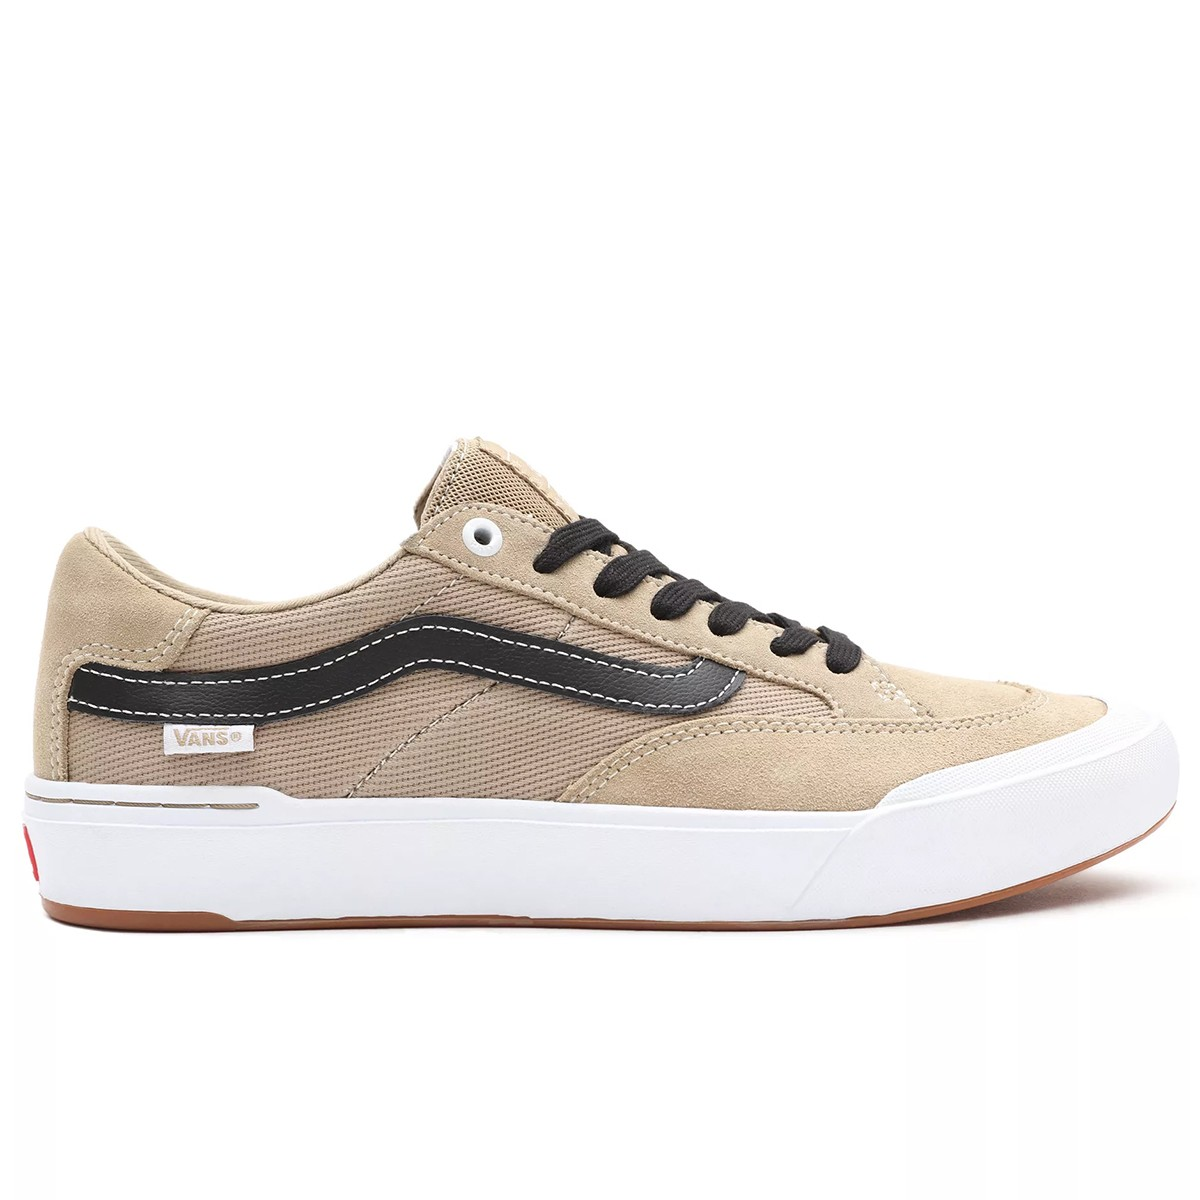 "VANS ""Berle Pro"" incense Skate shoes"